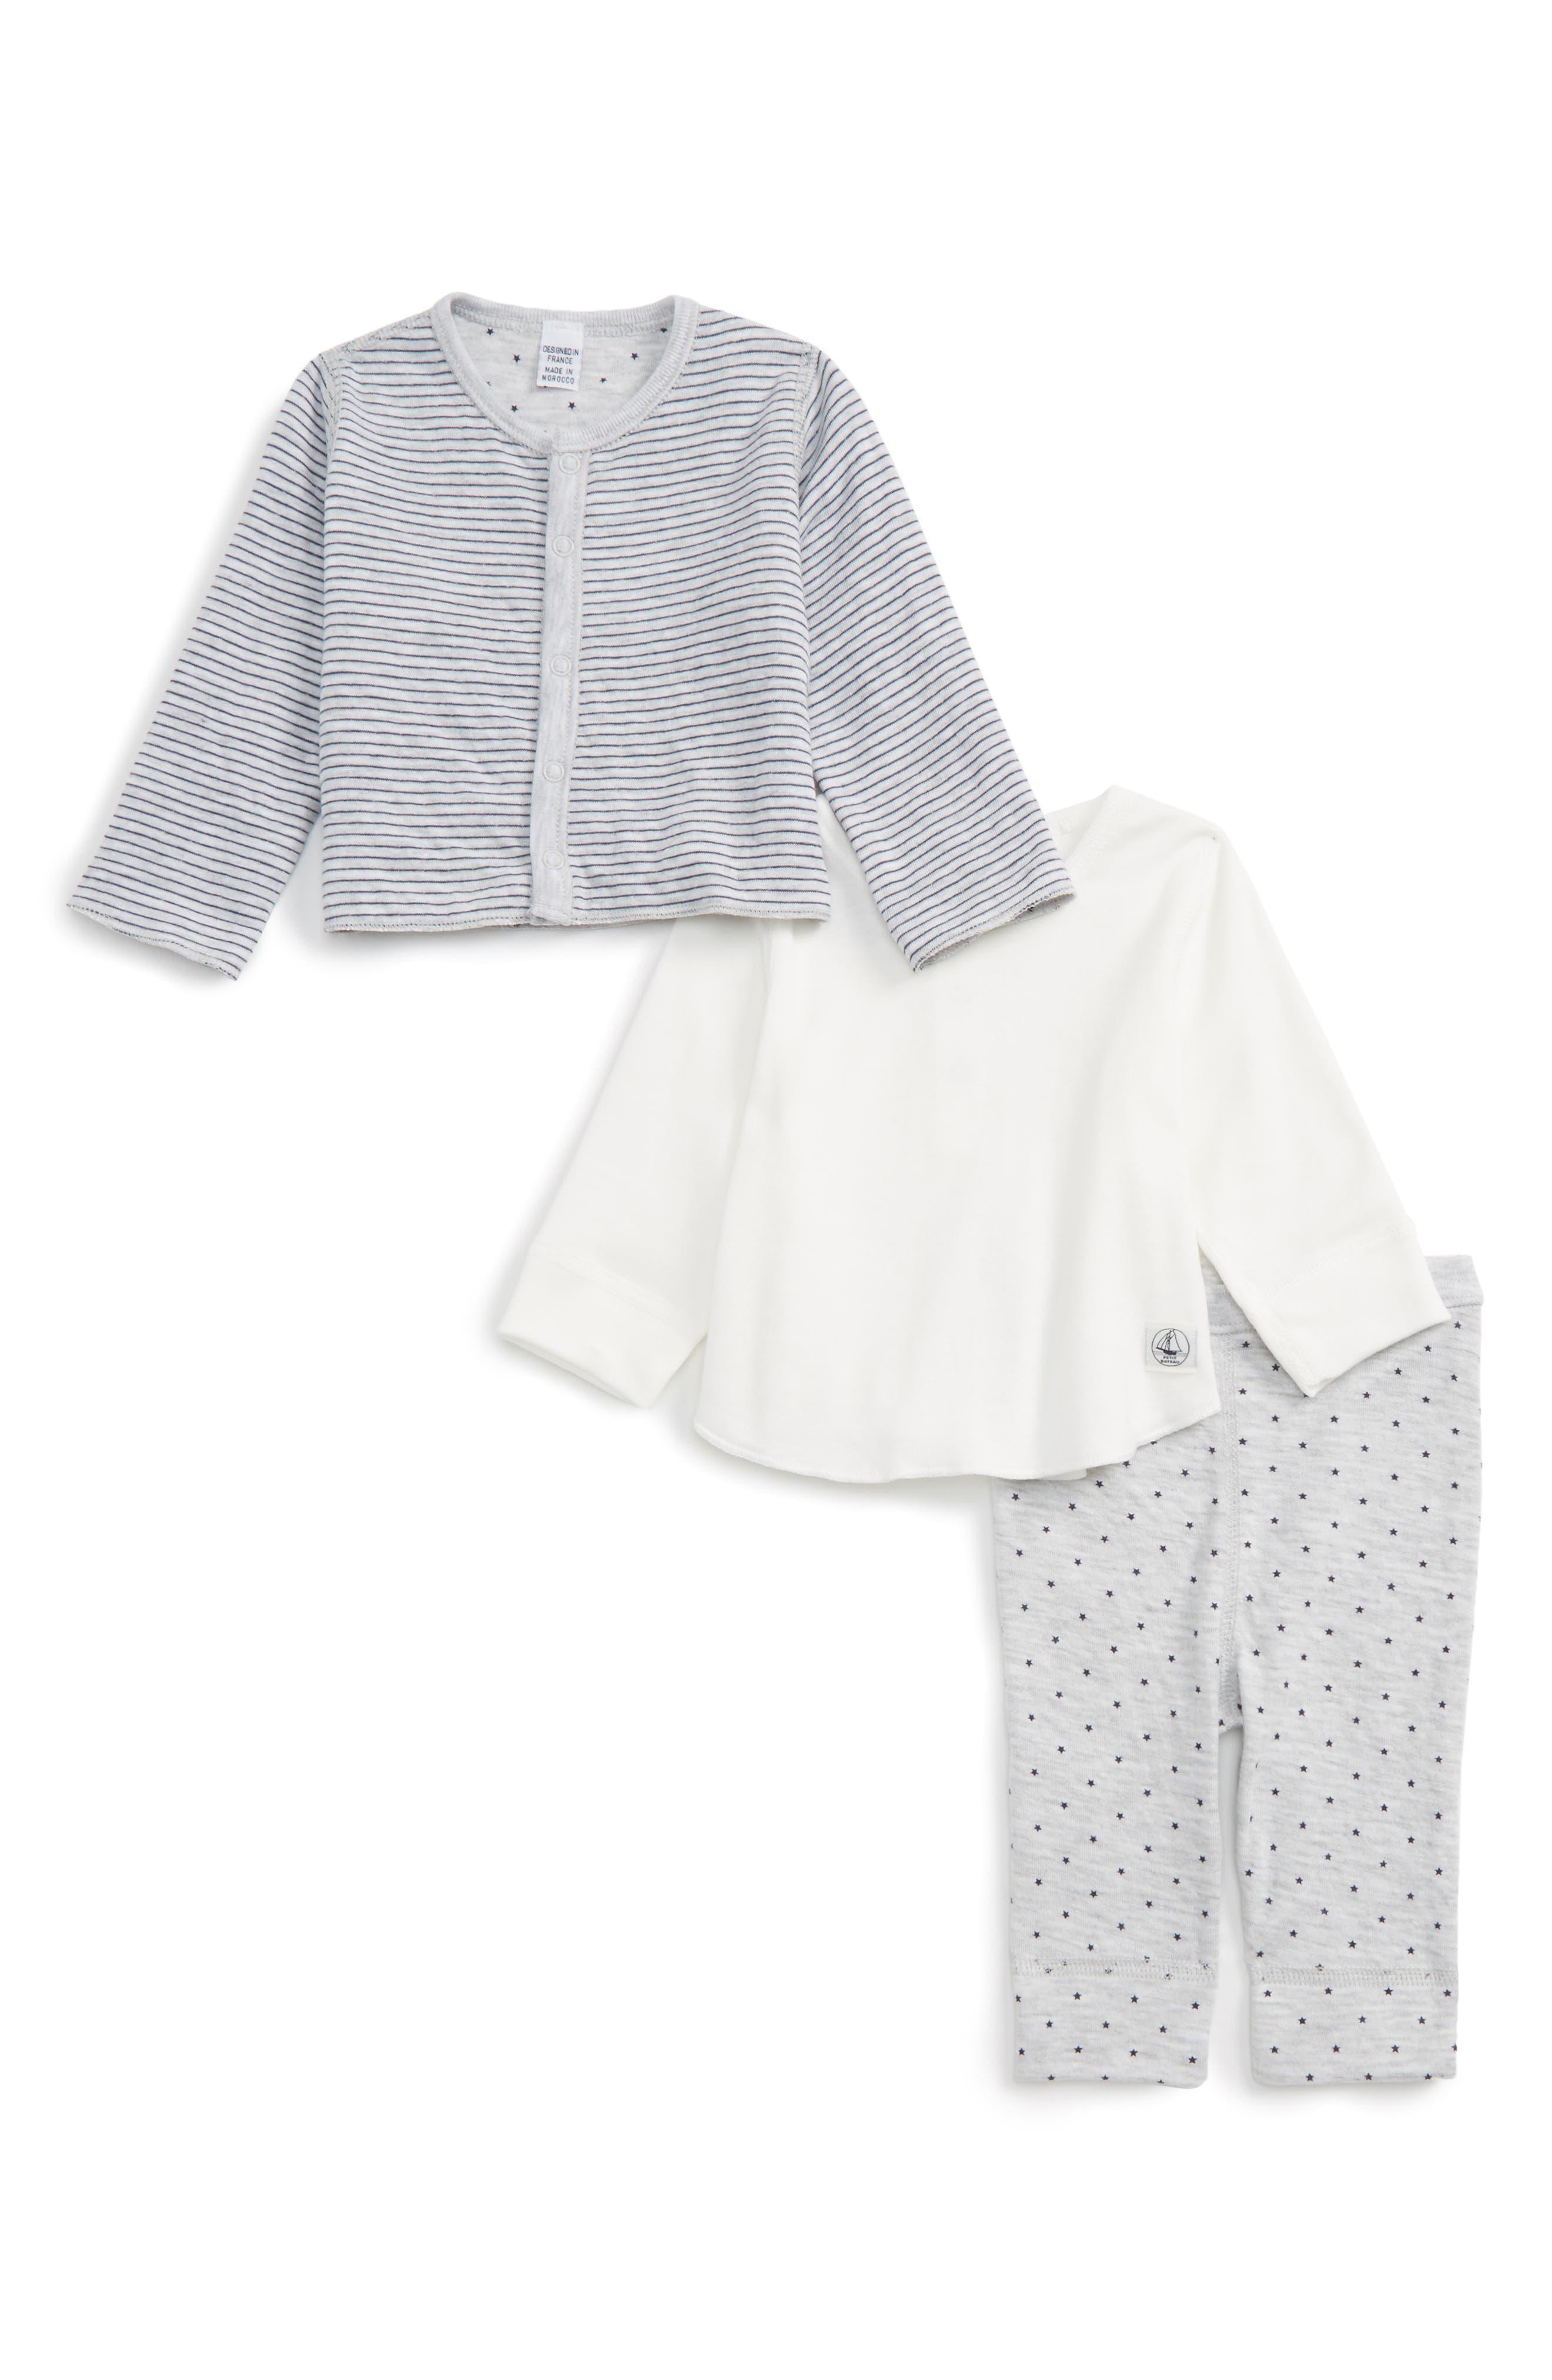 Main Image - Petit Bateau Jacket, Tee & Pants Set (Baby Girls)